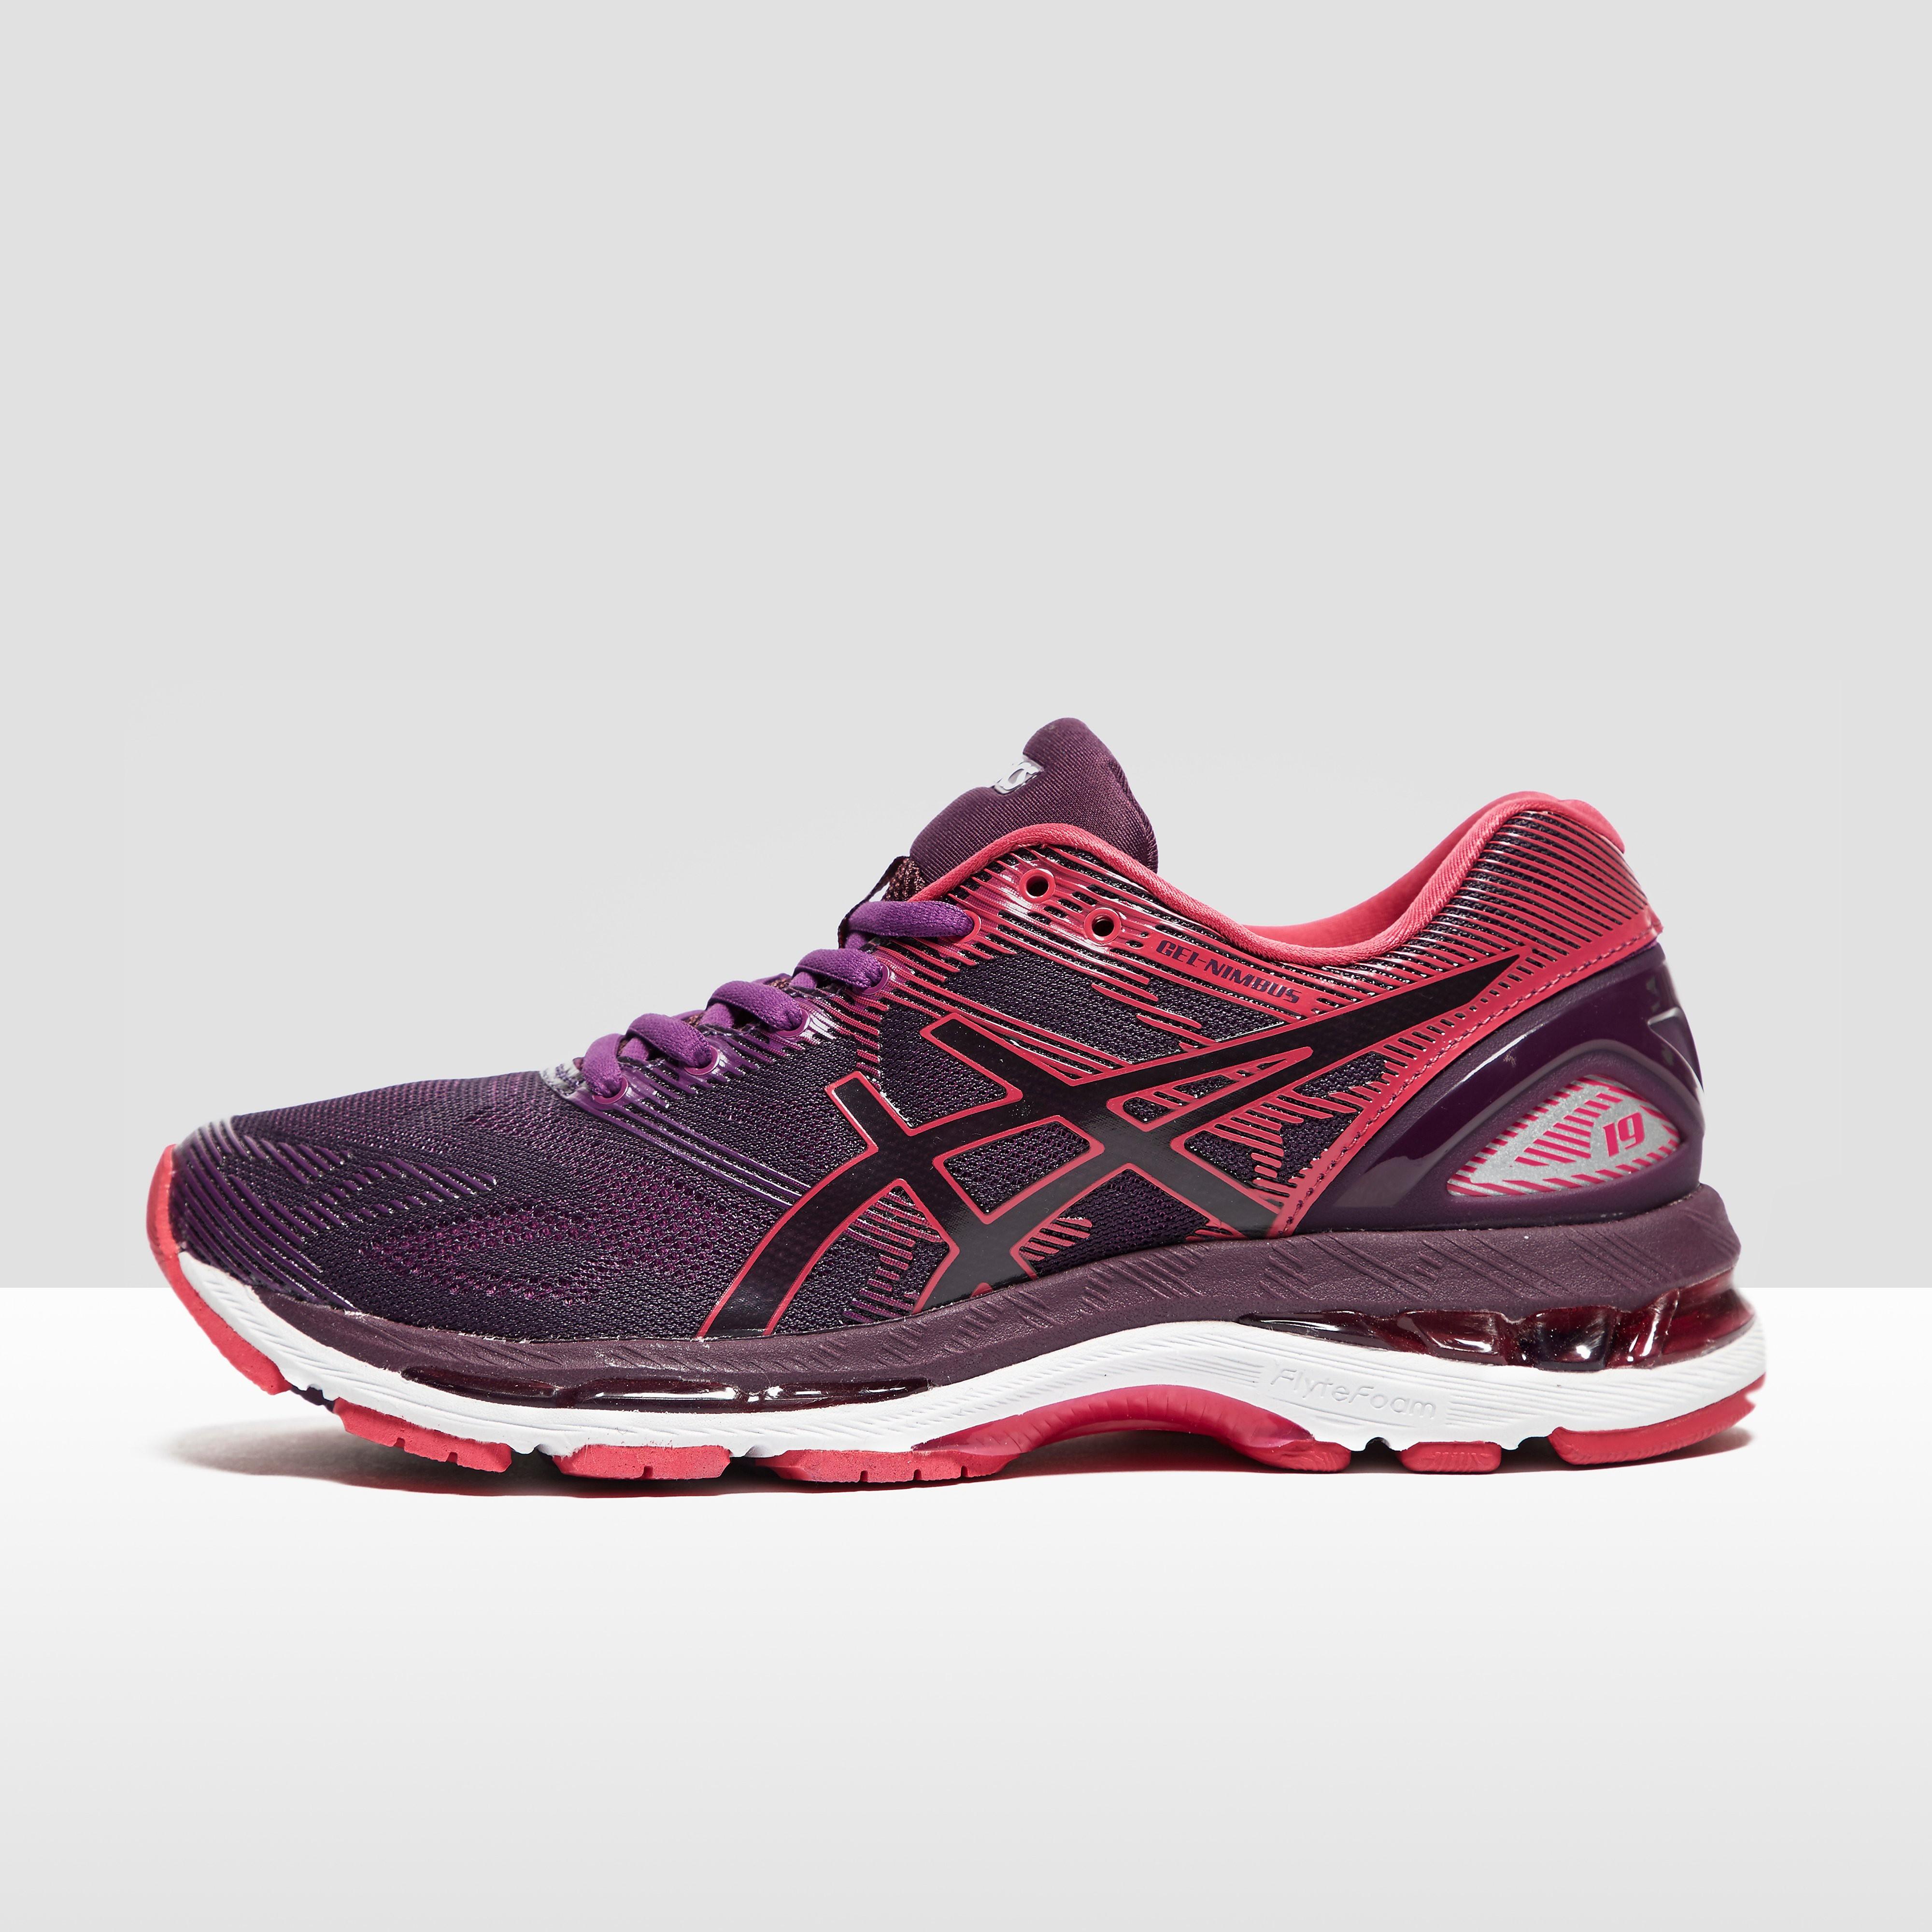 ASICS GEL-Nimbus 19 Women's Running Shoes